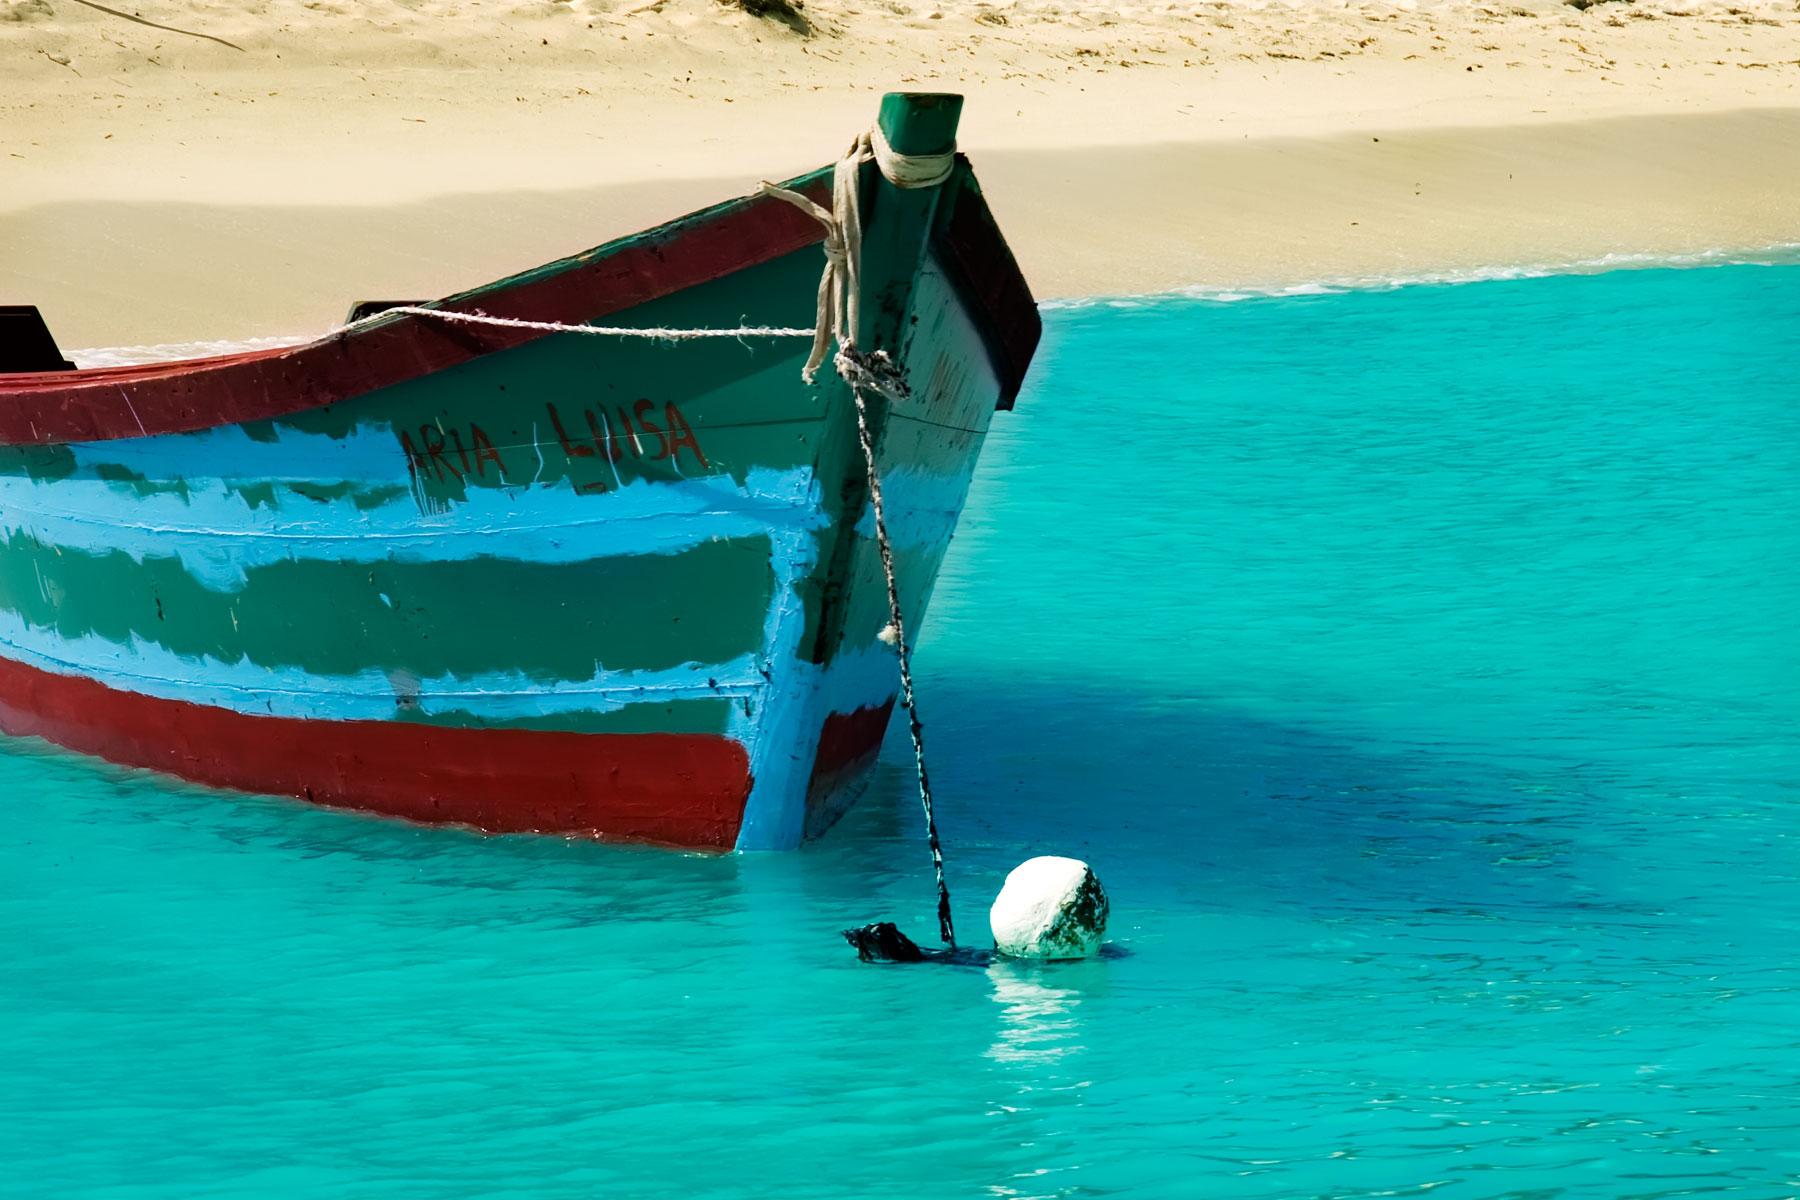 old-boat-dominican-republic